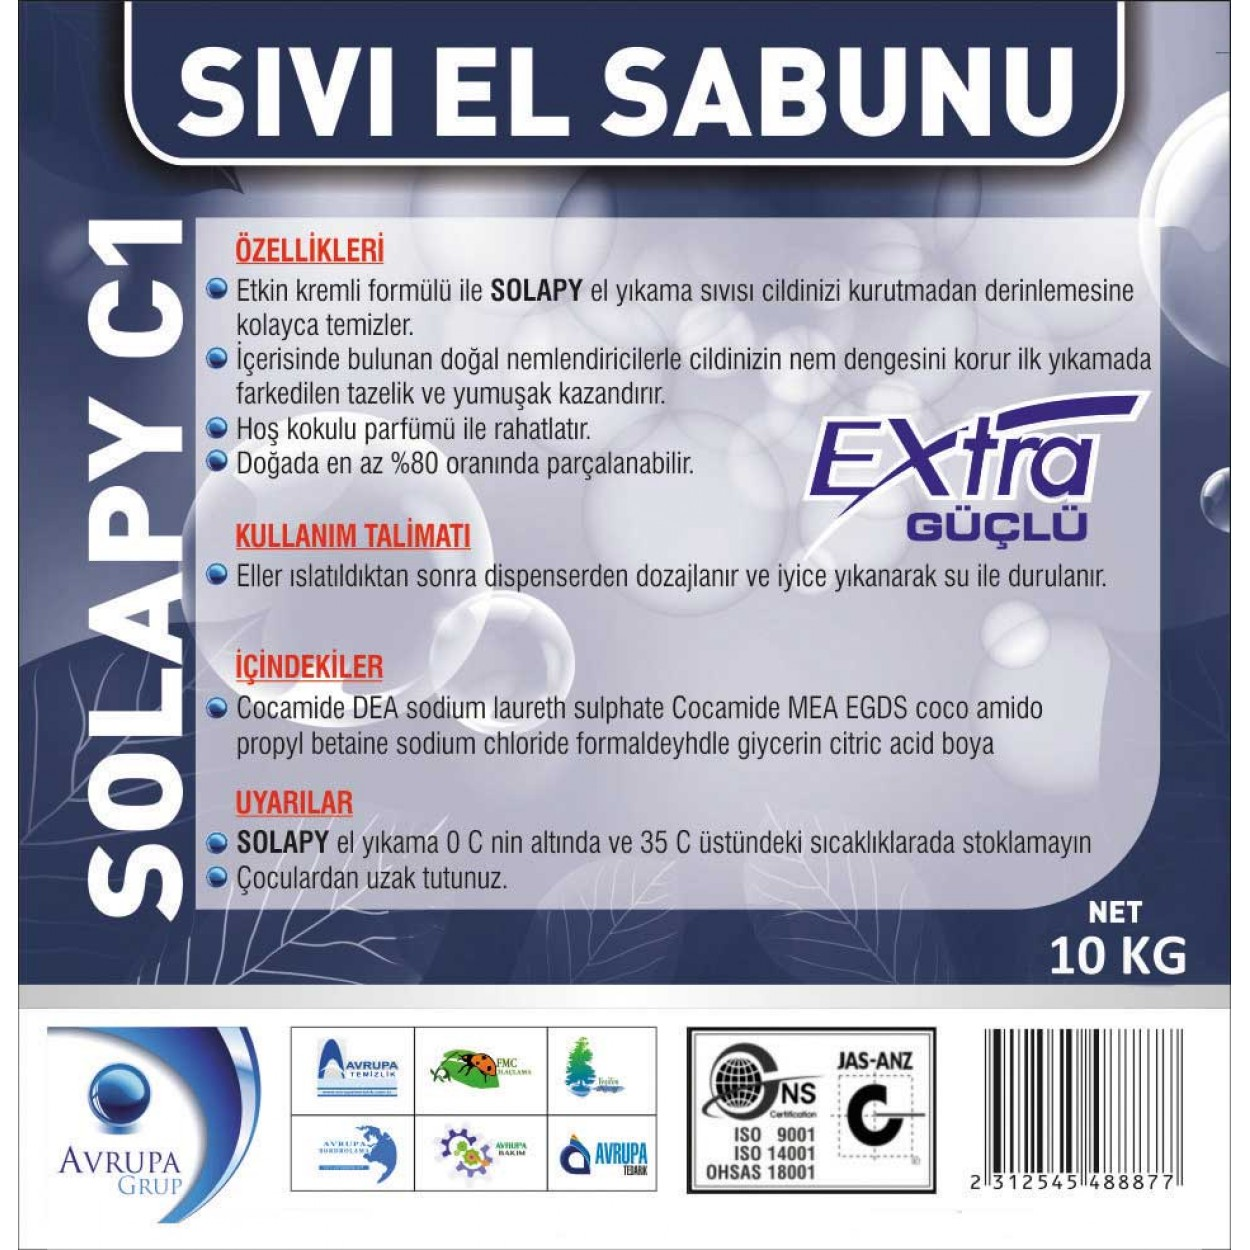 Solapy C1 Sedefli Parfümlü El Yıkama Sıvısı Ekstra 10 Litre